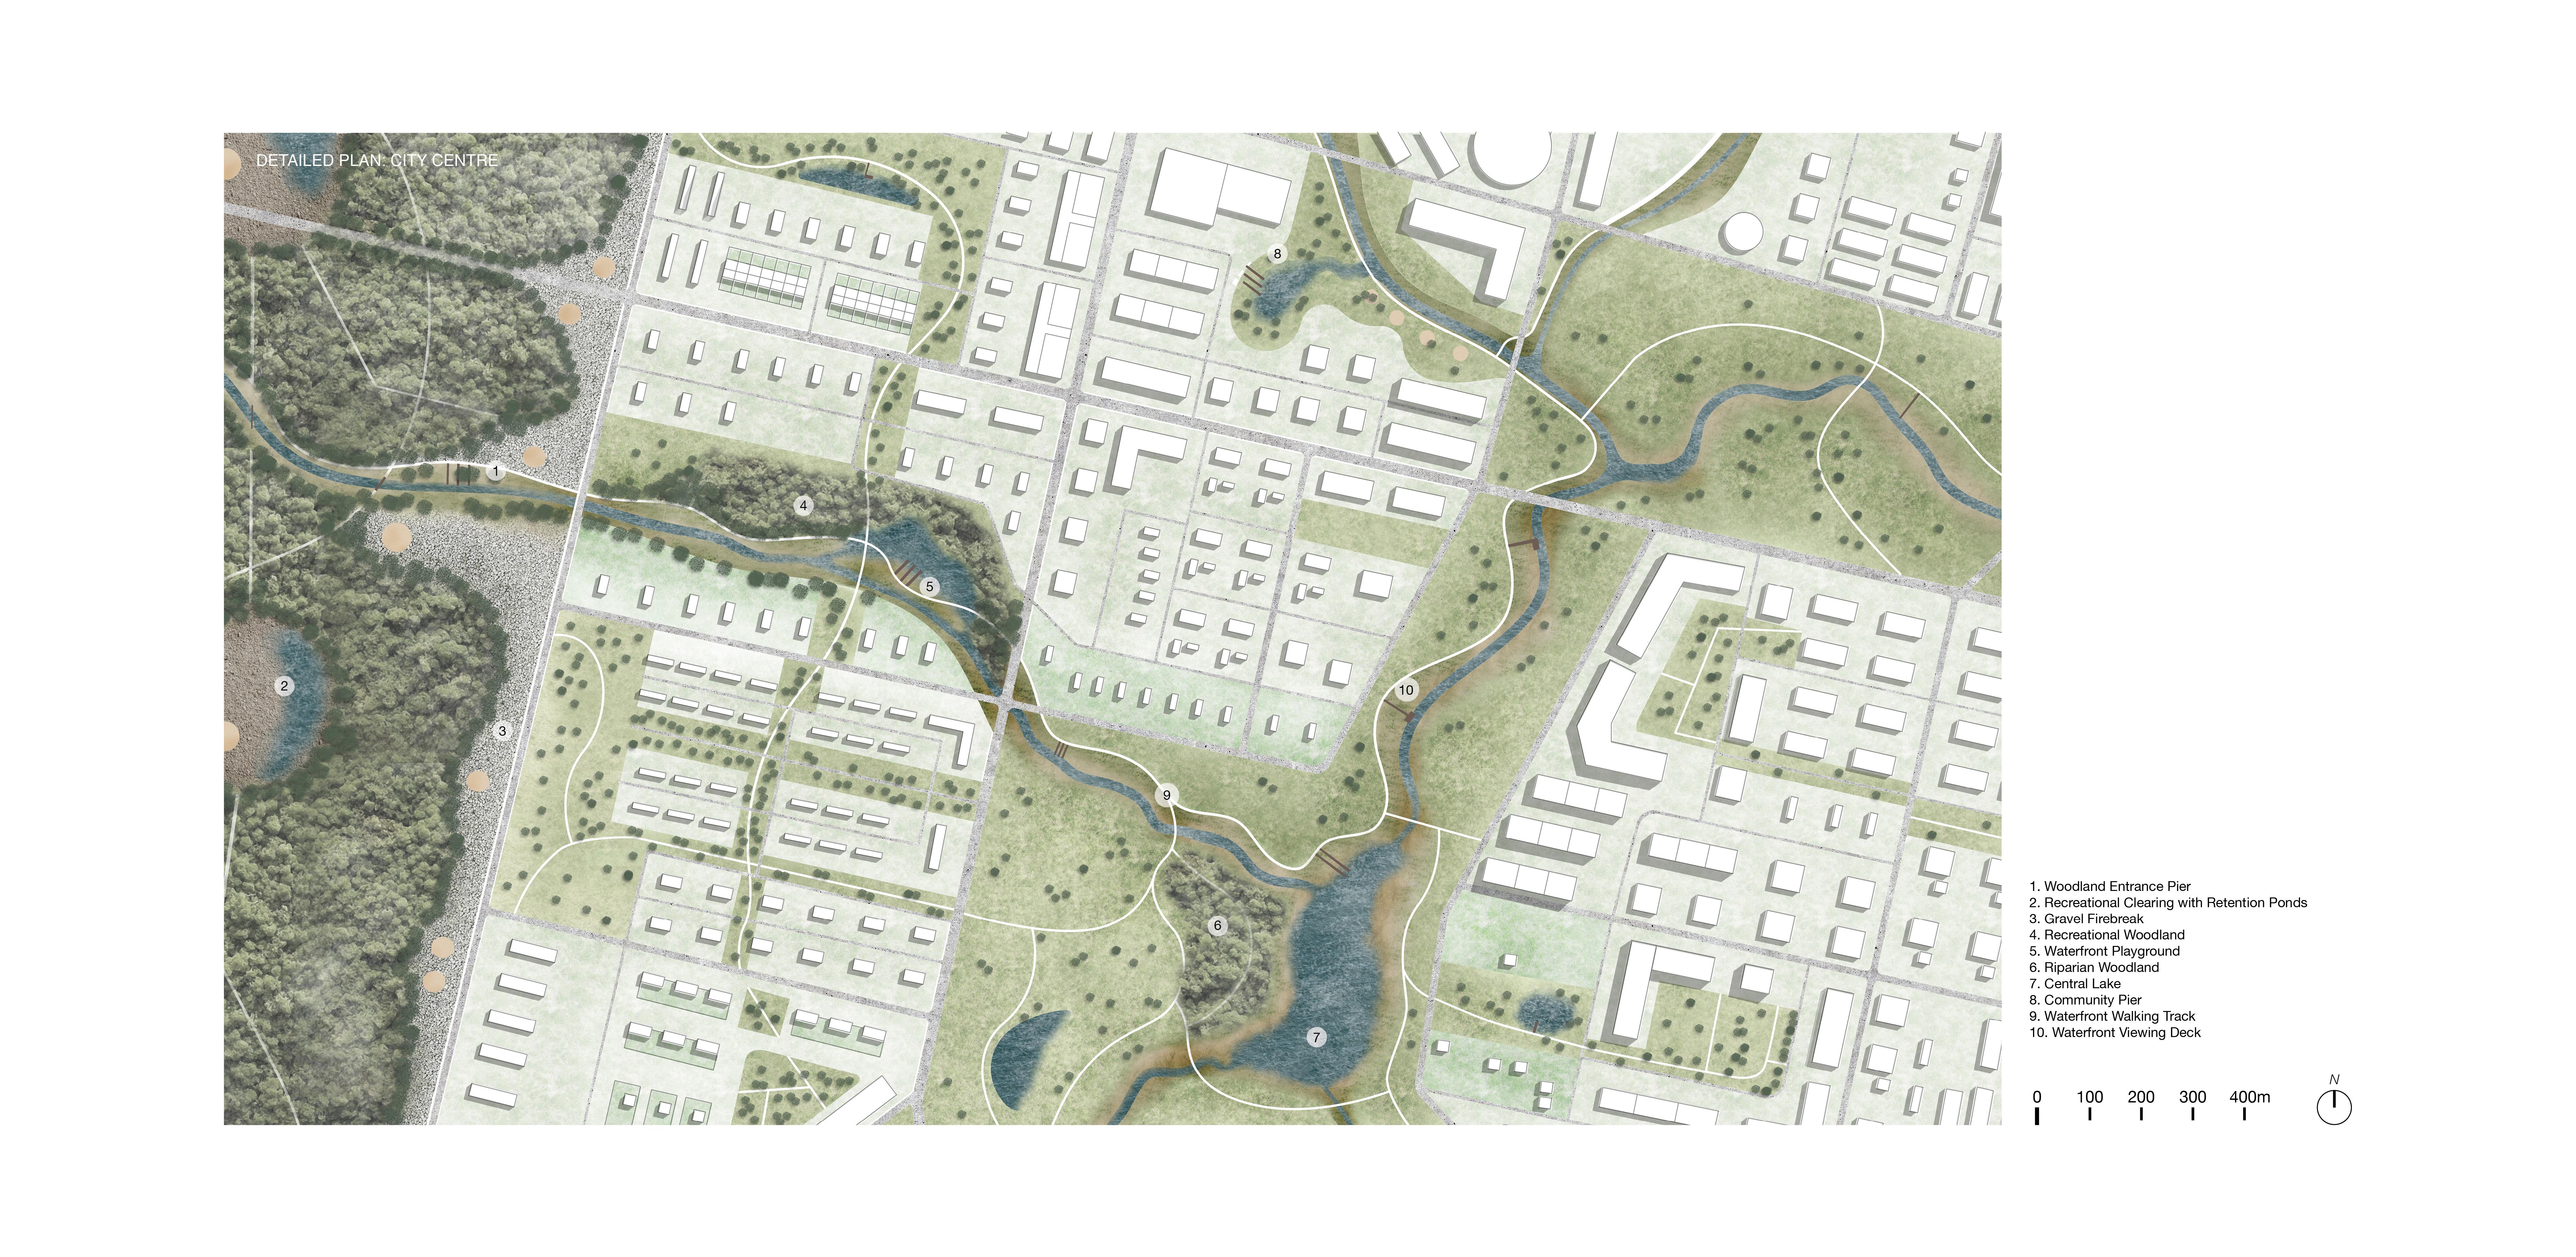 Detailed Plan: City Centre